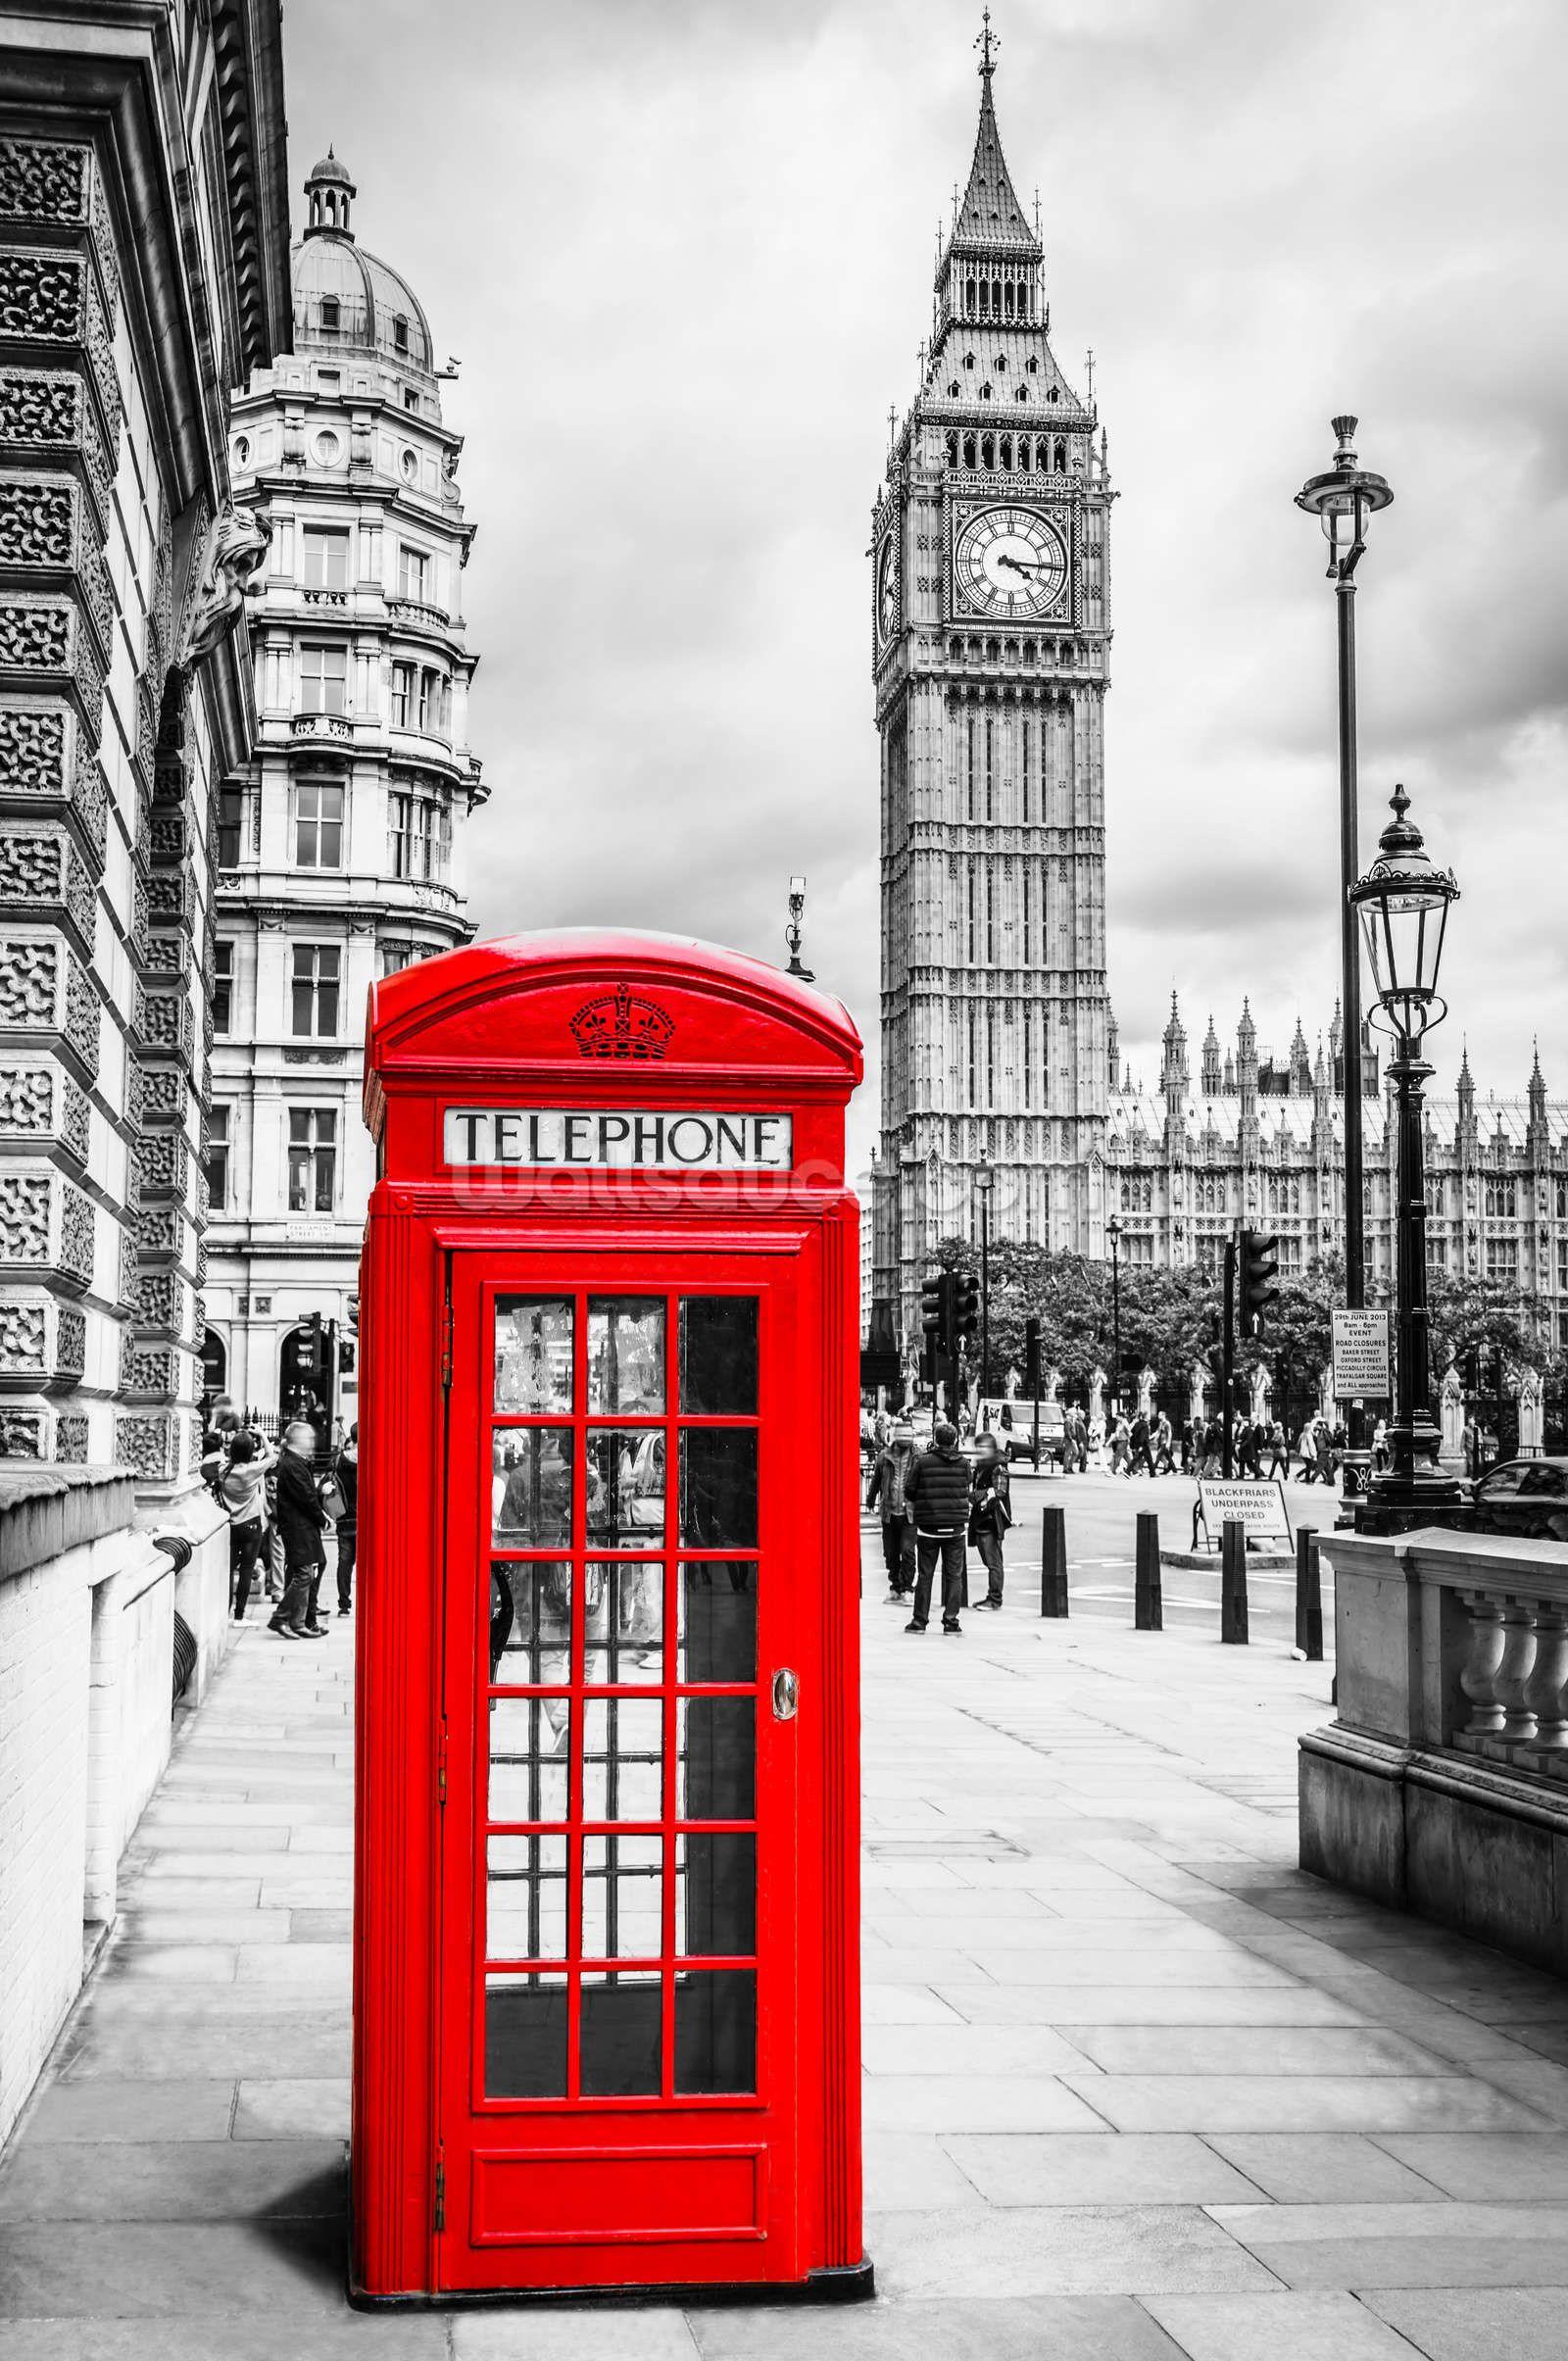 London Telephone Box Wallpaper Mural Wallsauce Uk London Telephone Booth London Wallpaper London Canvas Wall Art